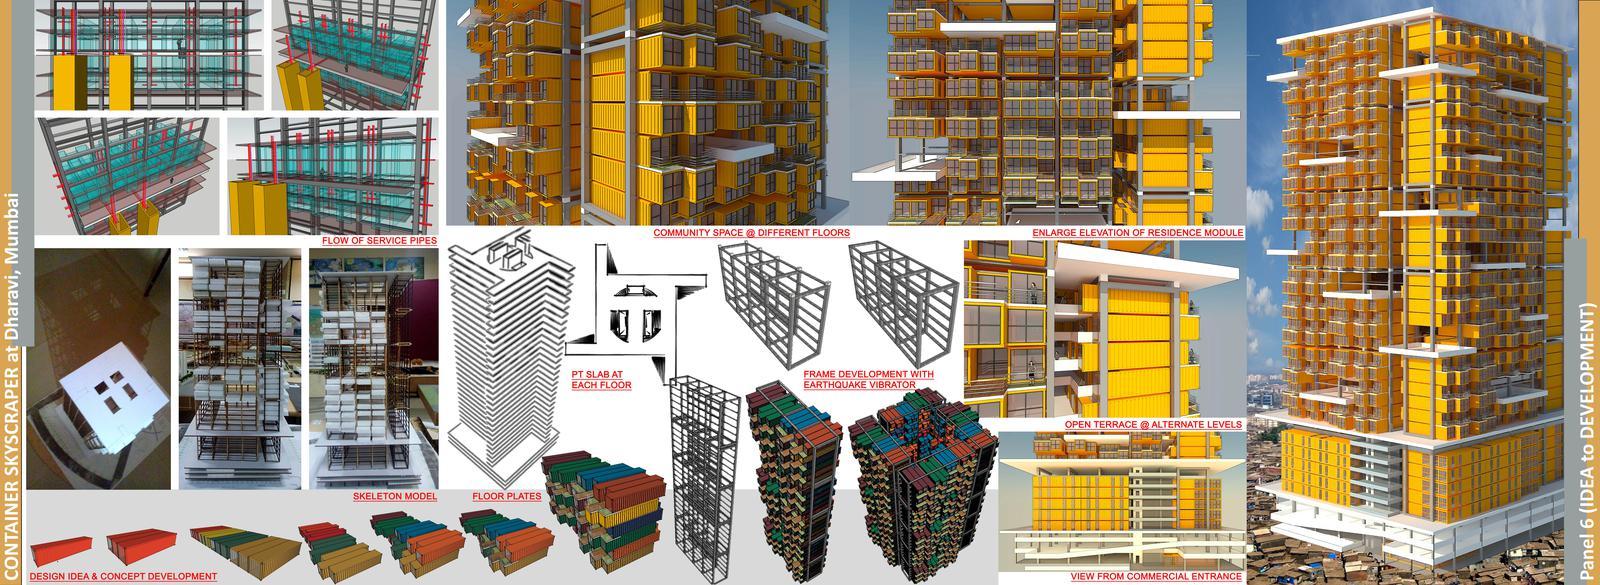 Container Skyscaper at Dharavi, Mumbai